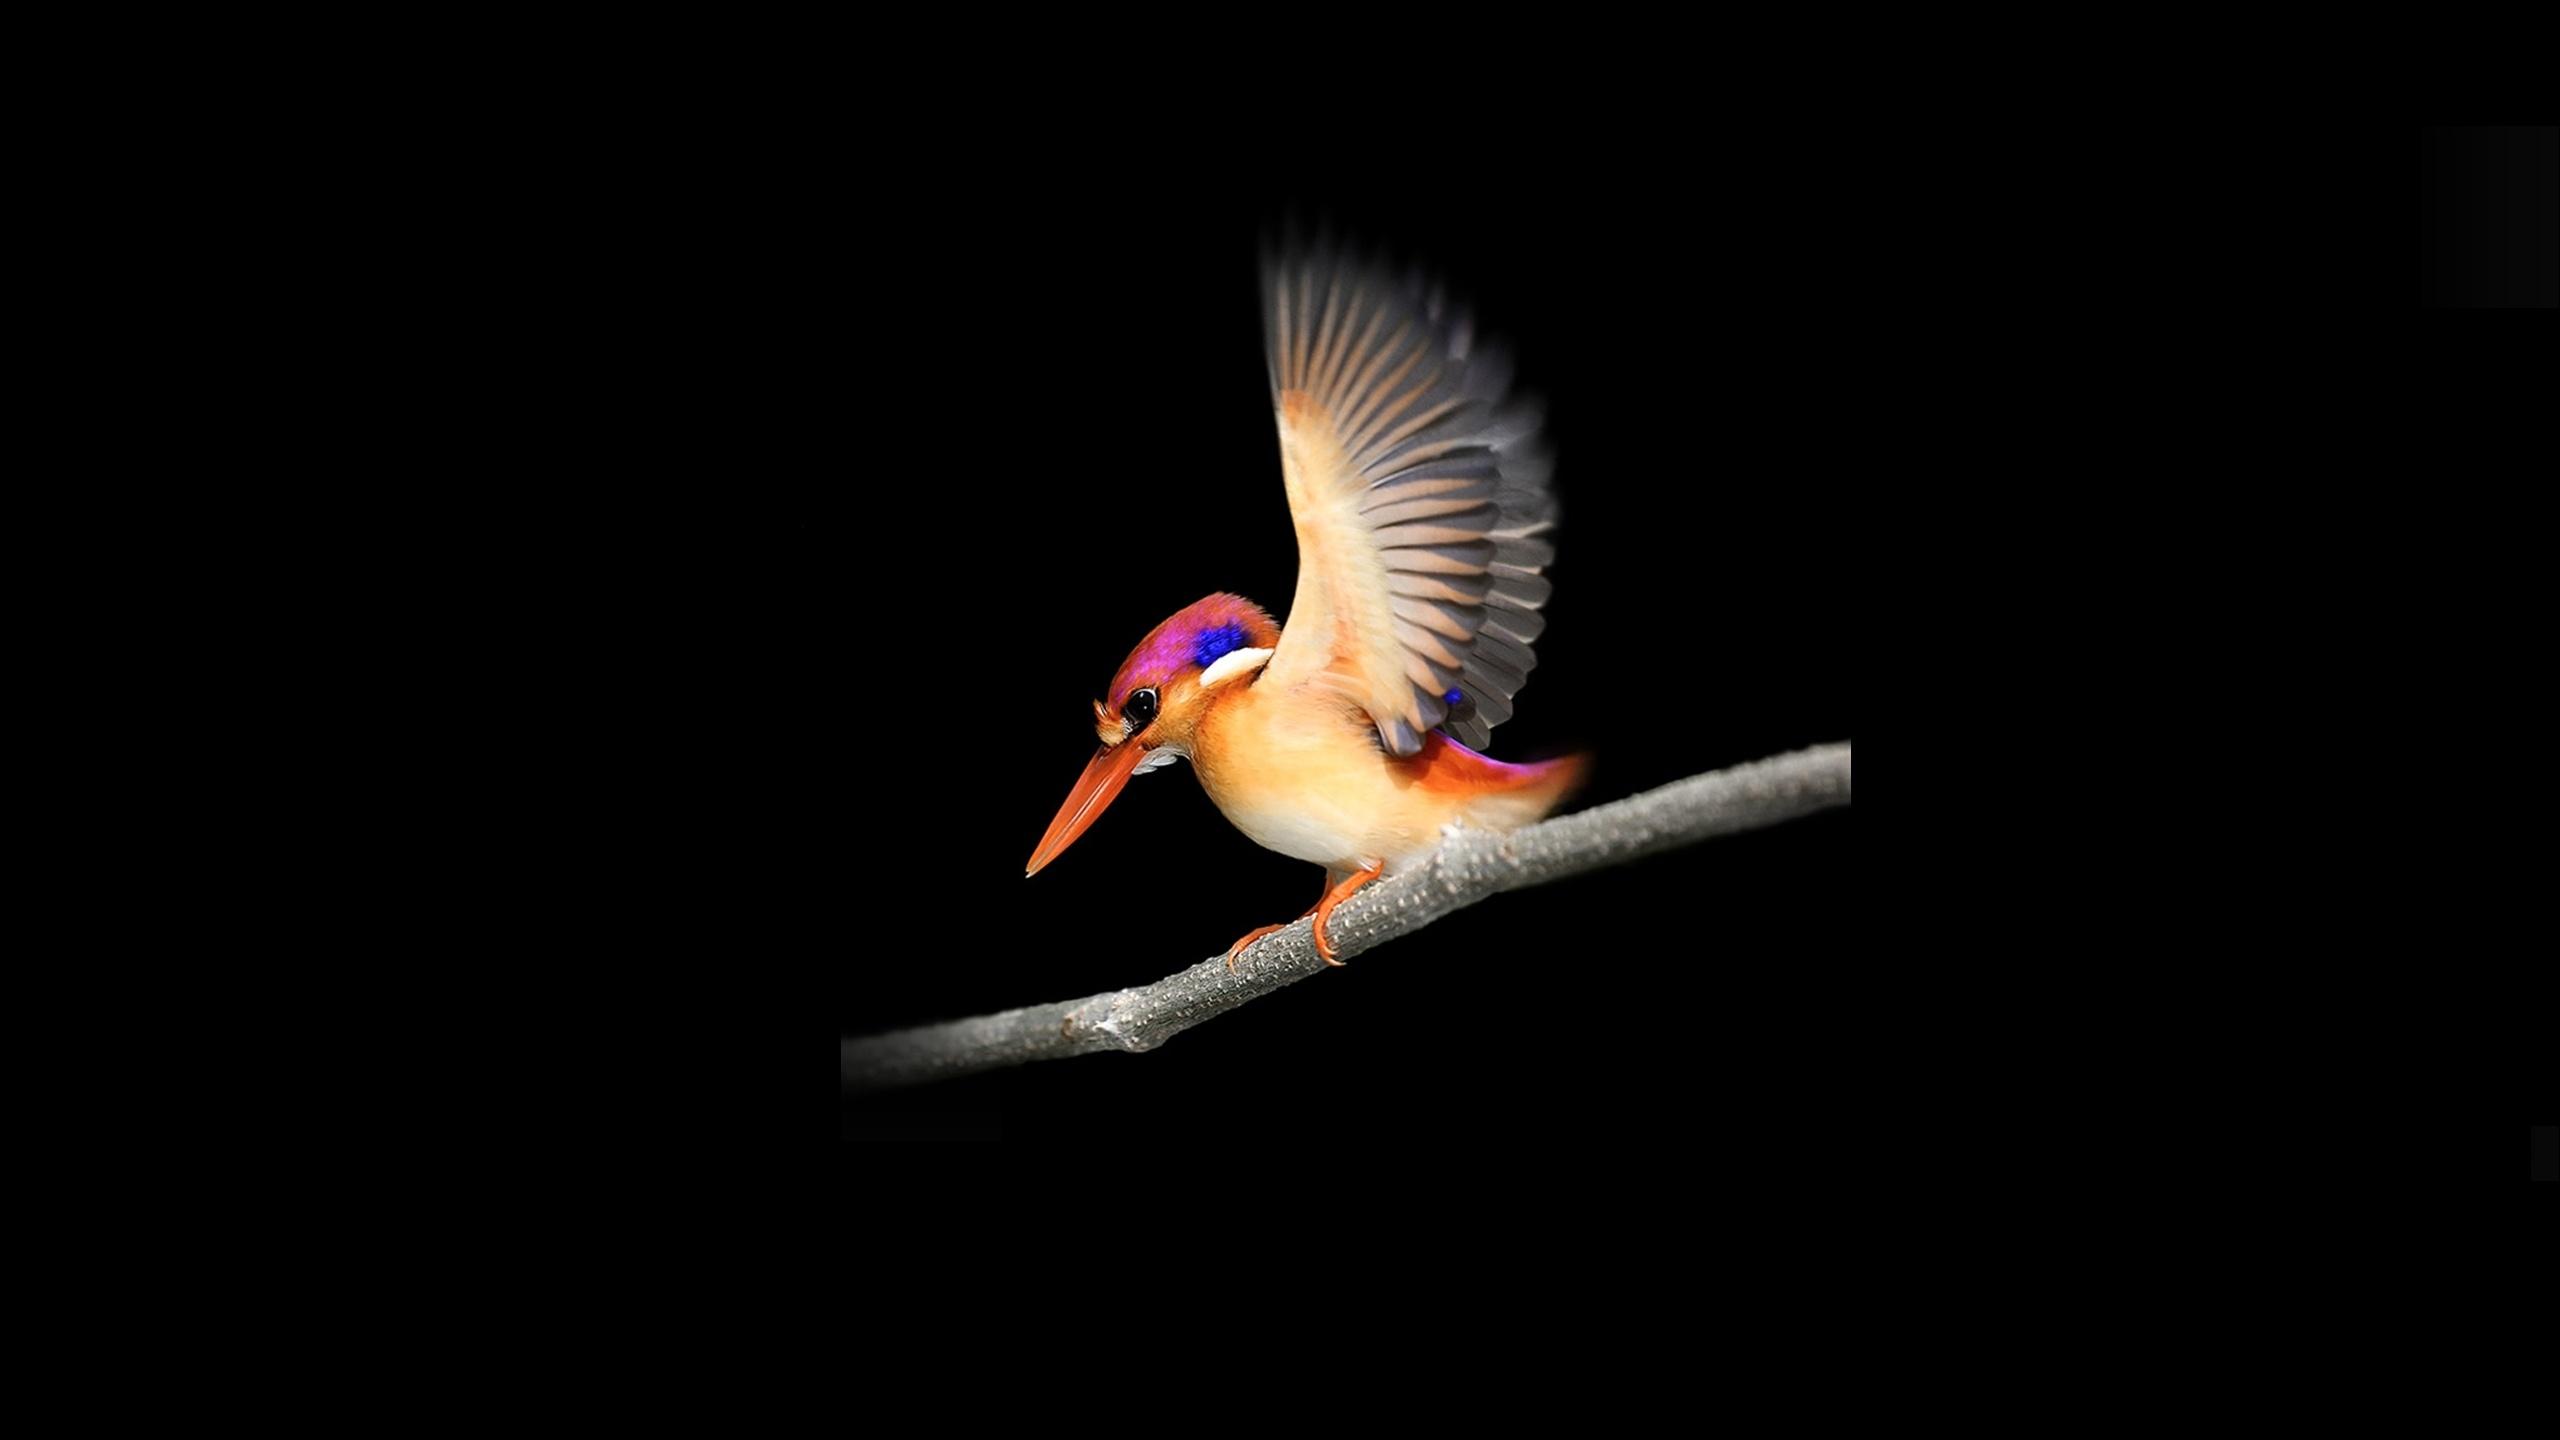 Download 2560x1440 Wallpaper Woodpecker Microsoft Surface